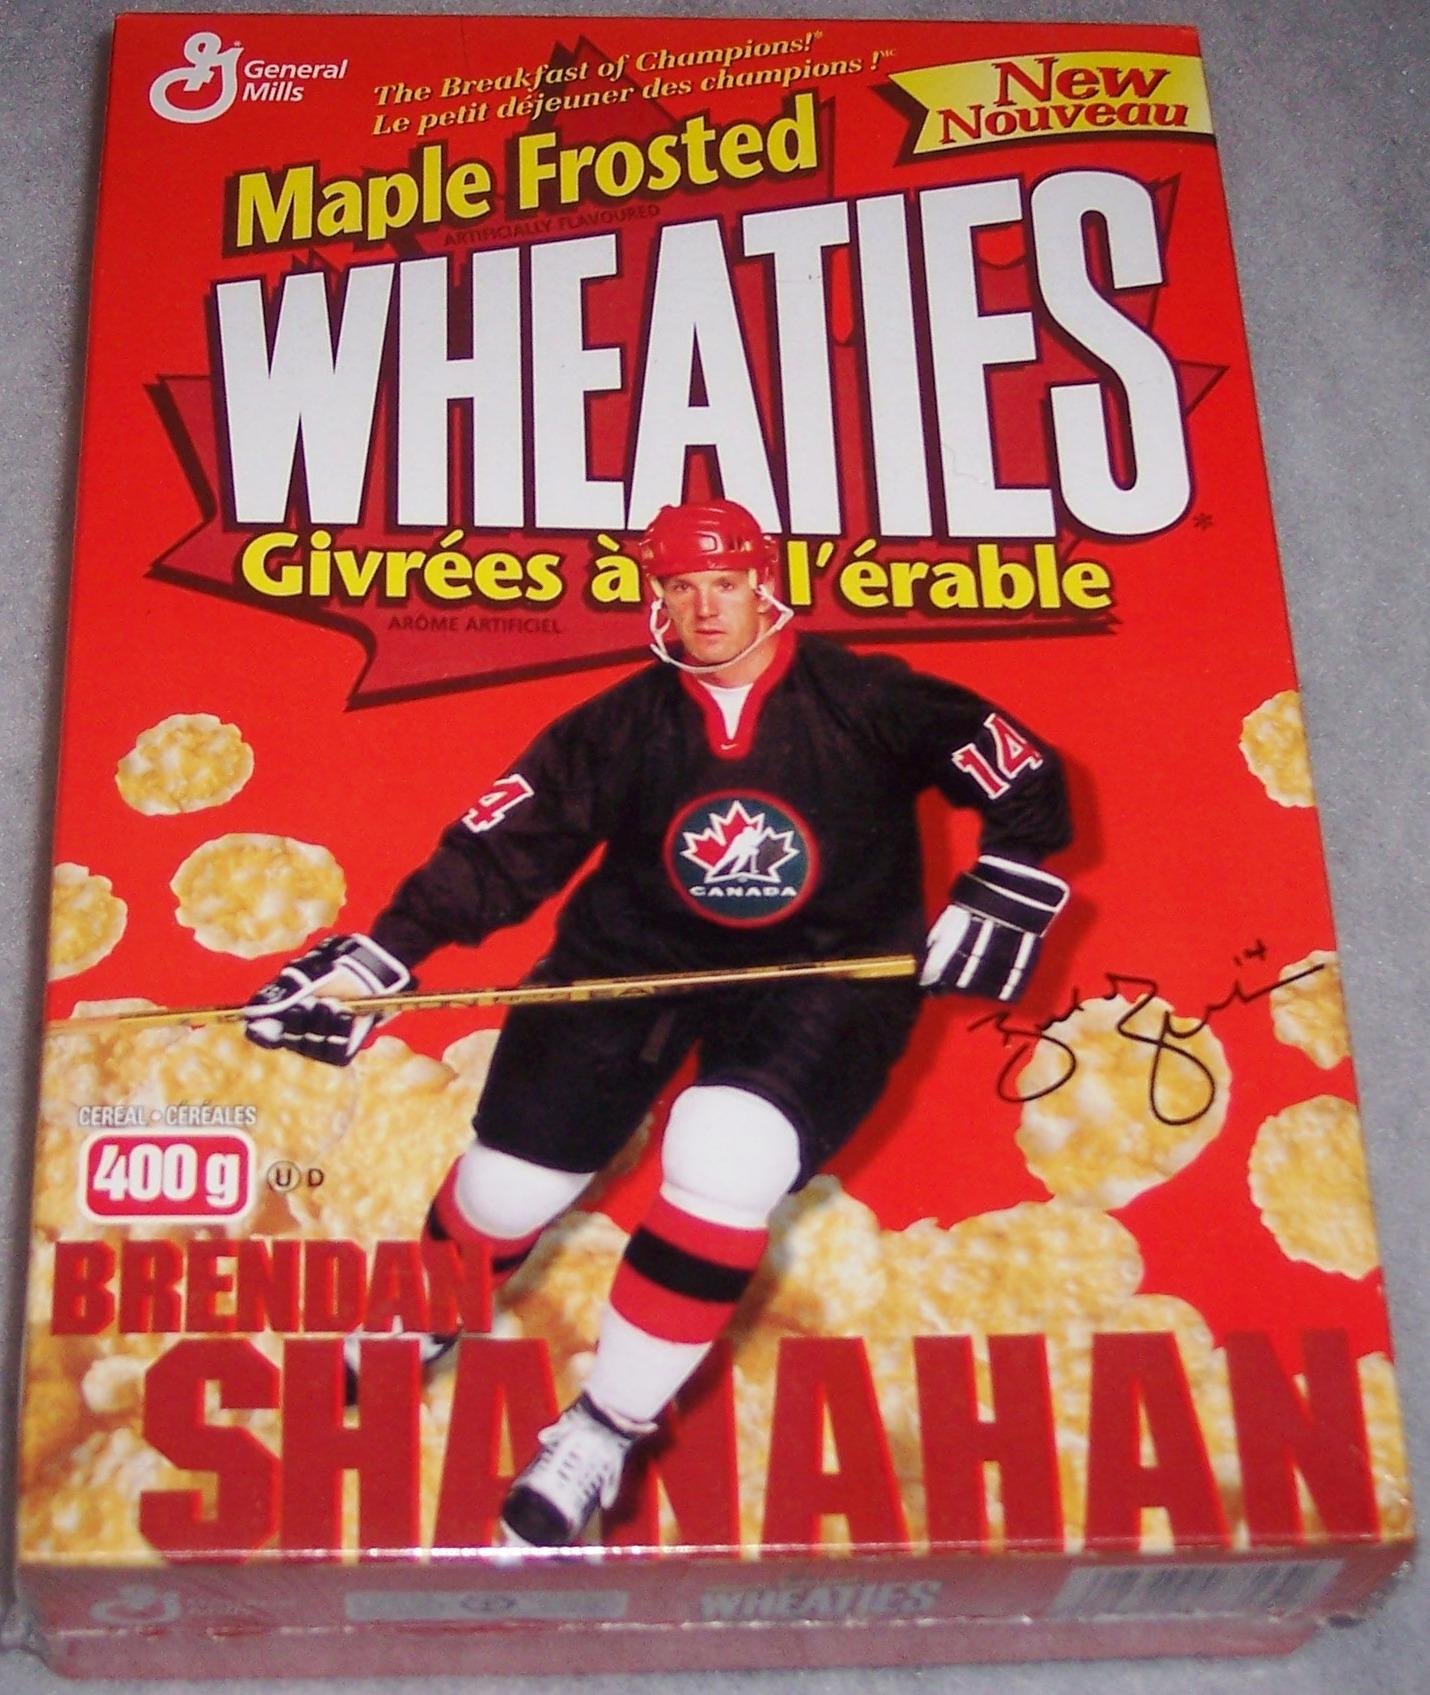 1998 Brendan Shanahan (MFW) Wheaties Box